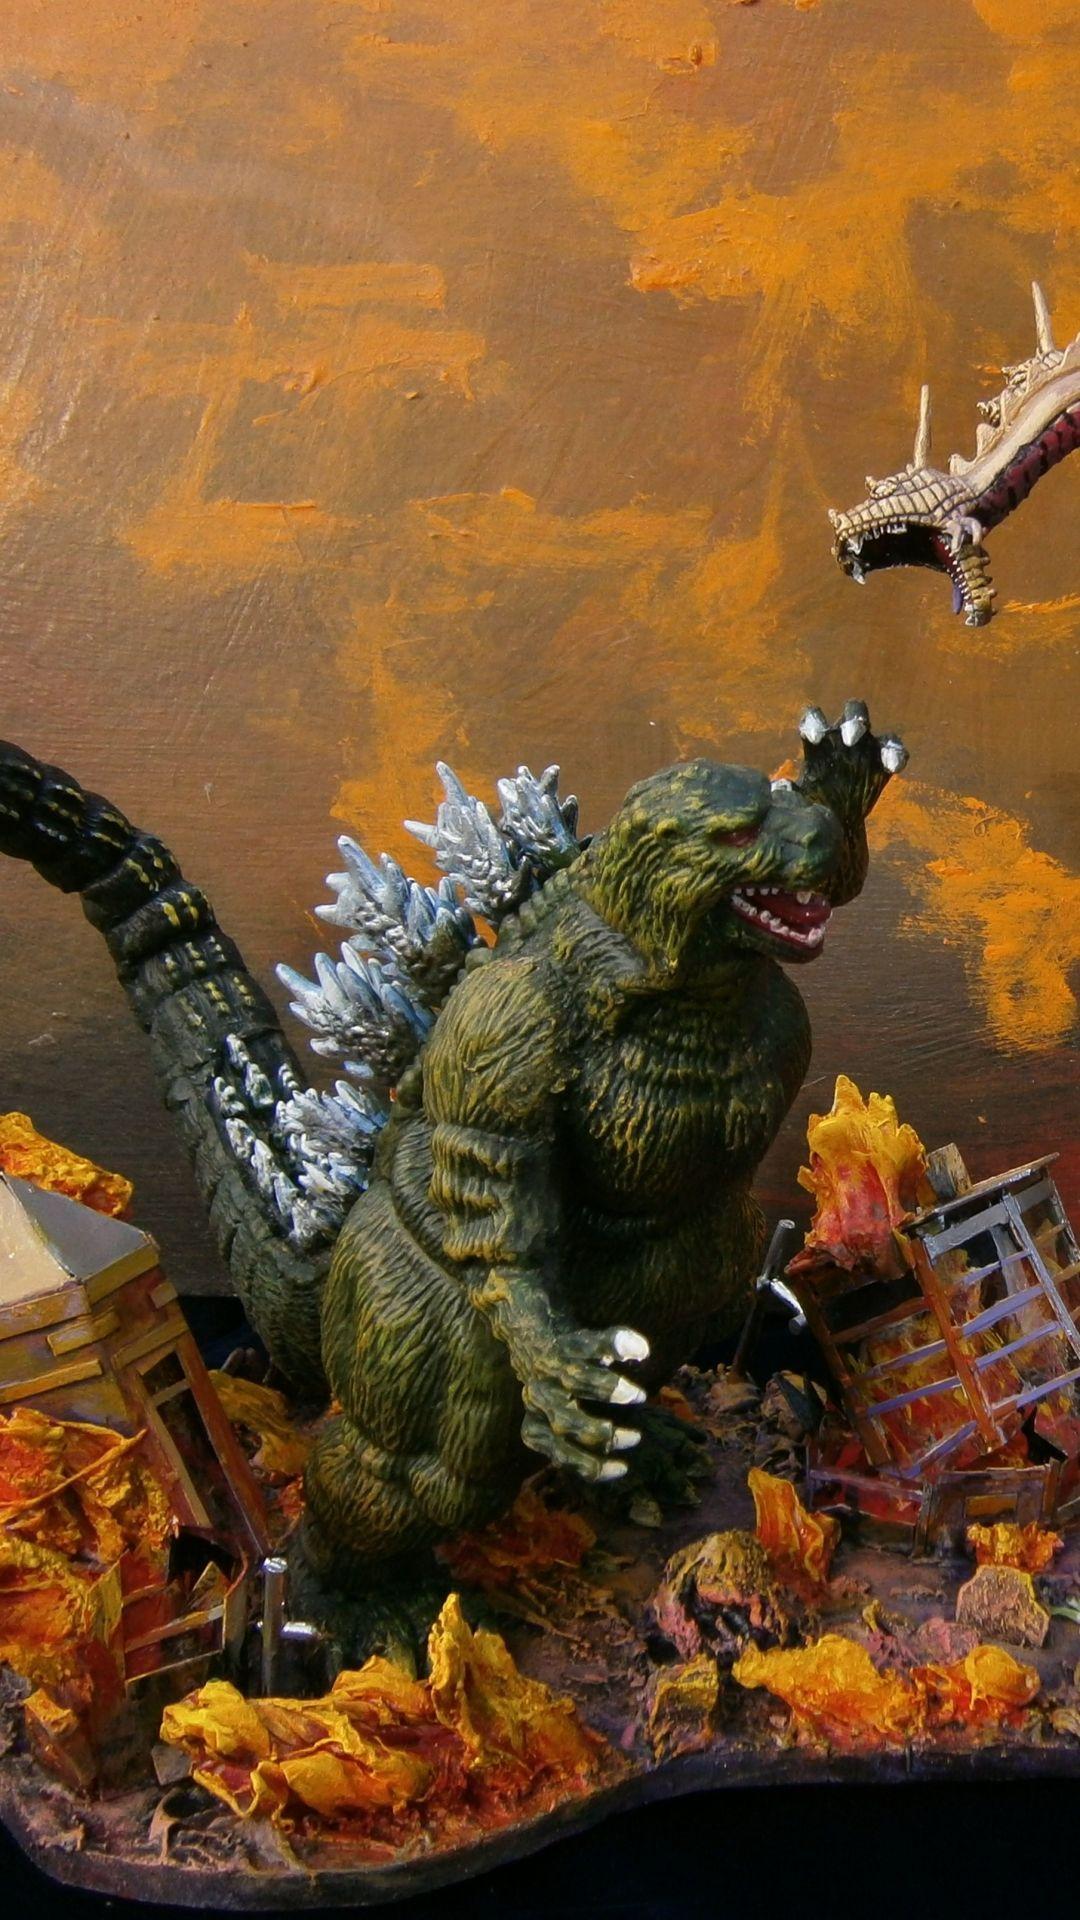 Godzilla Vs. King Ghidorah Wallpapers - Top Free Godzilla ...